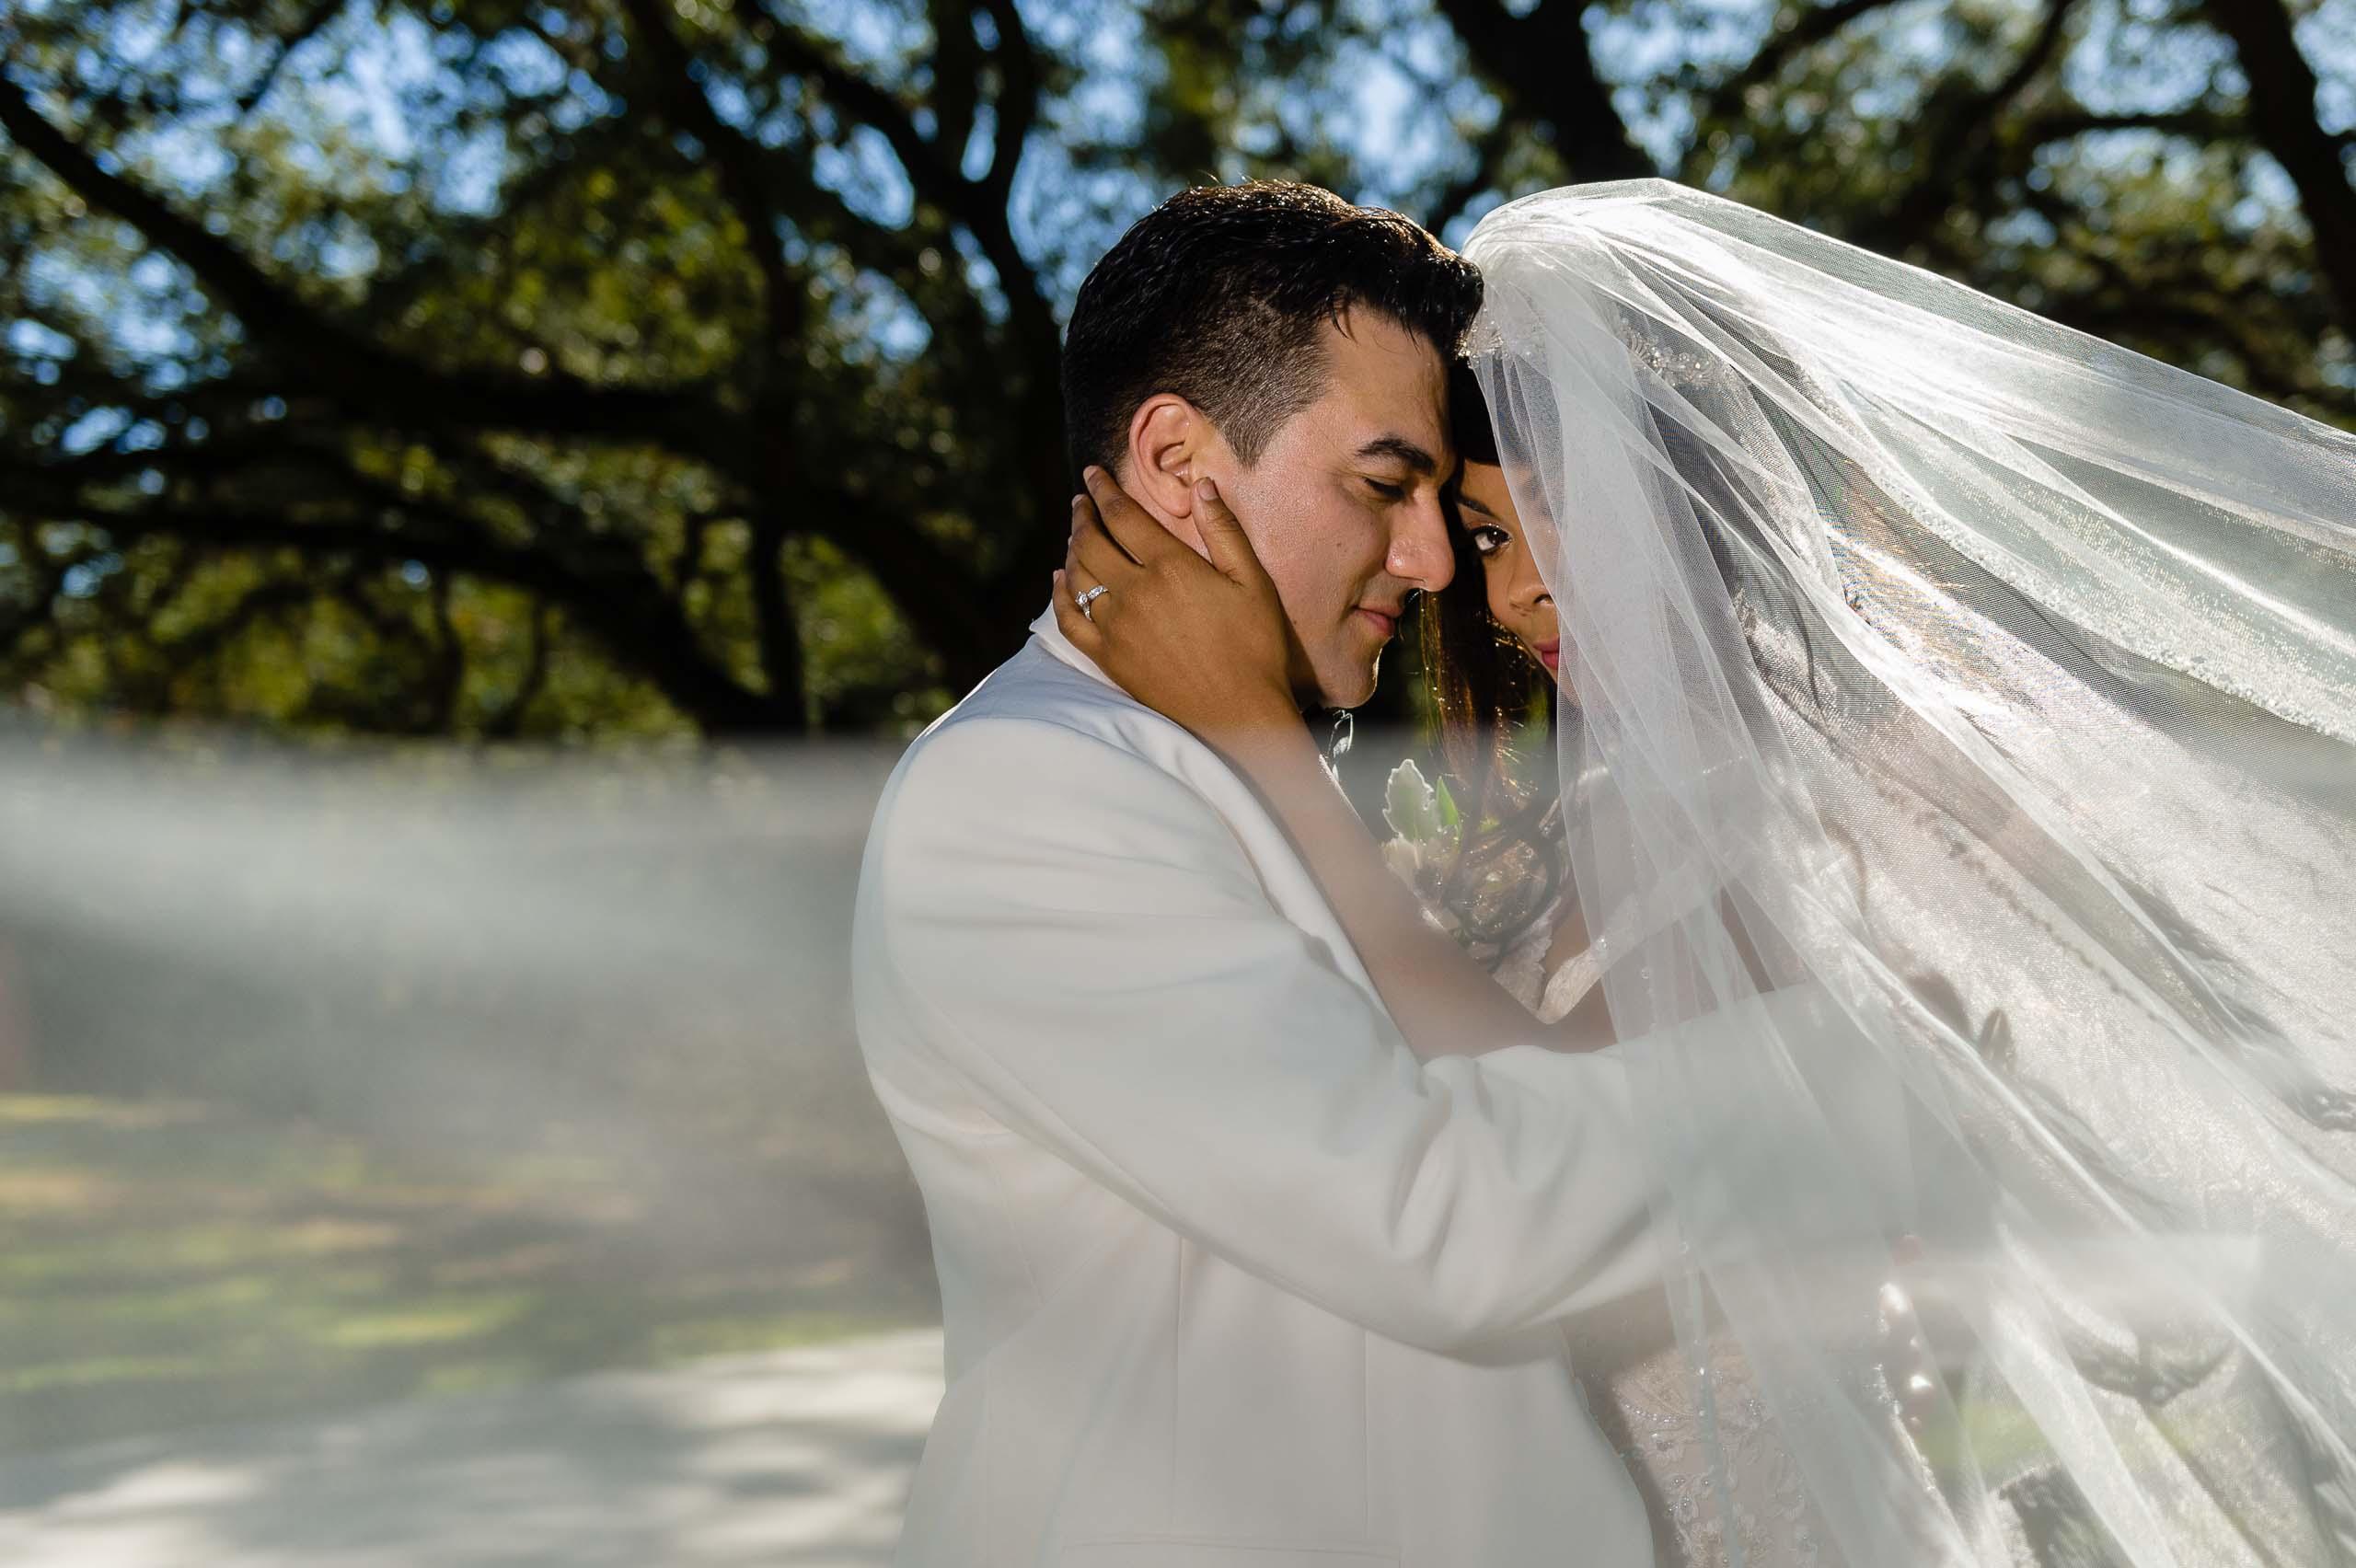 chandelier-of-gruene-winter-wedding-inspiration-_4S27880